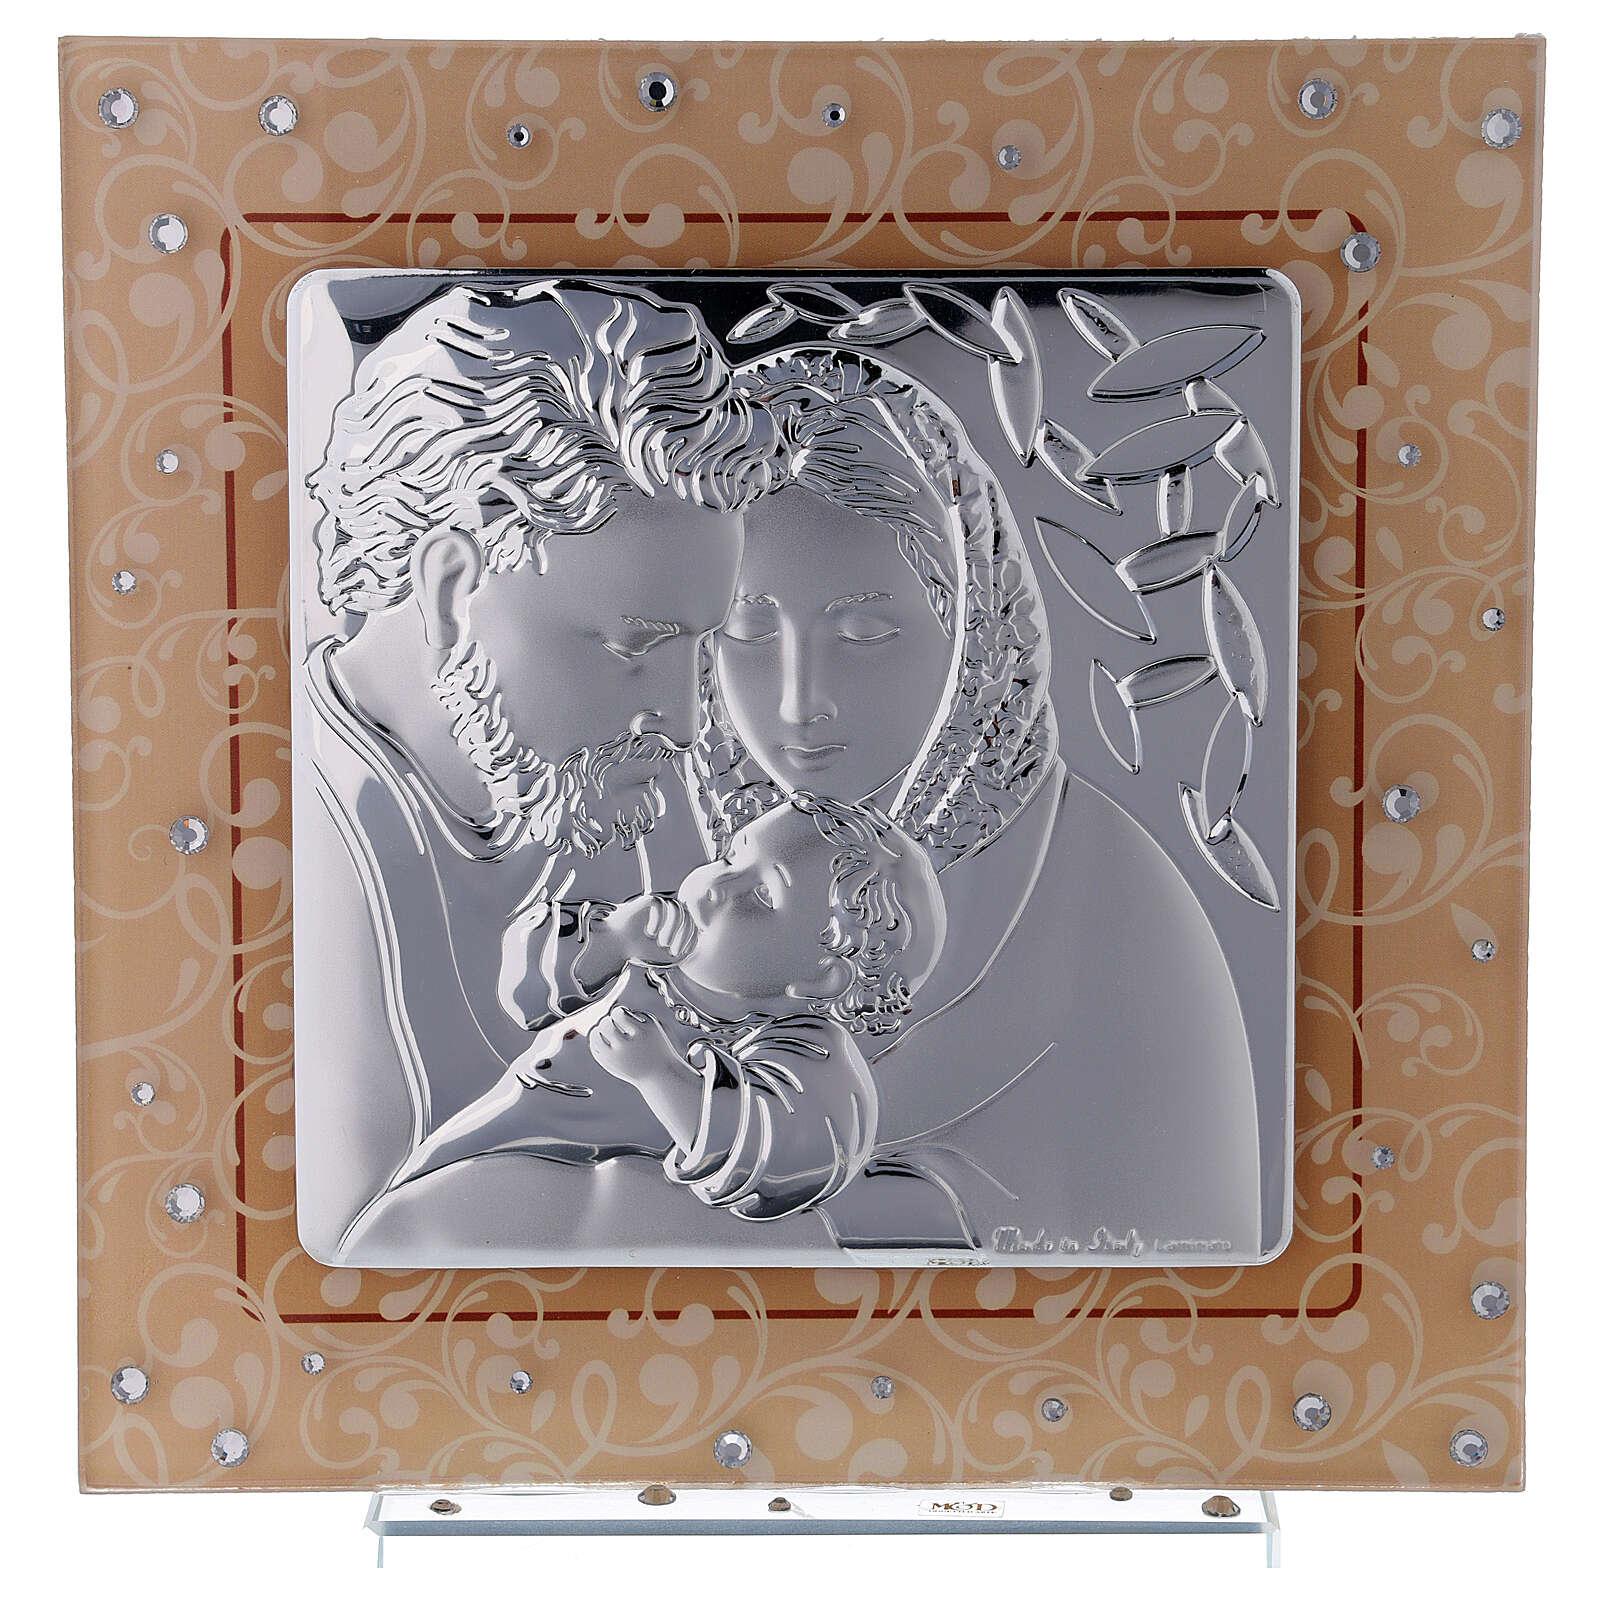 Cadre Sainte Famille argent bilaminé verre Murano ambre 17x17 cm 3